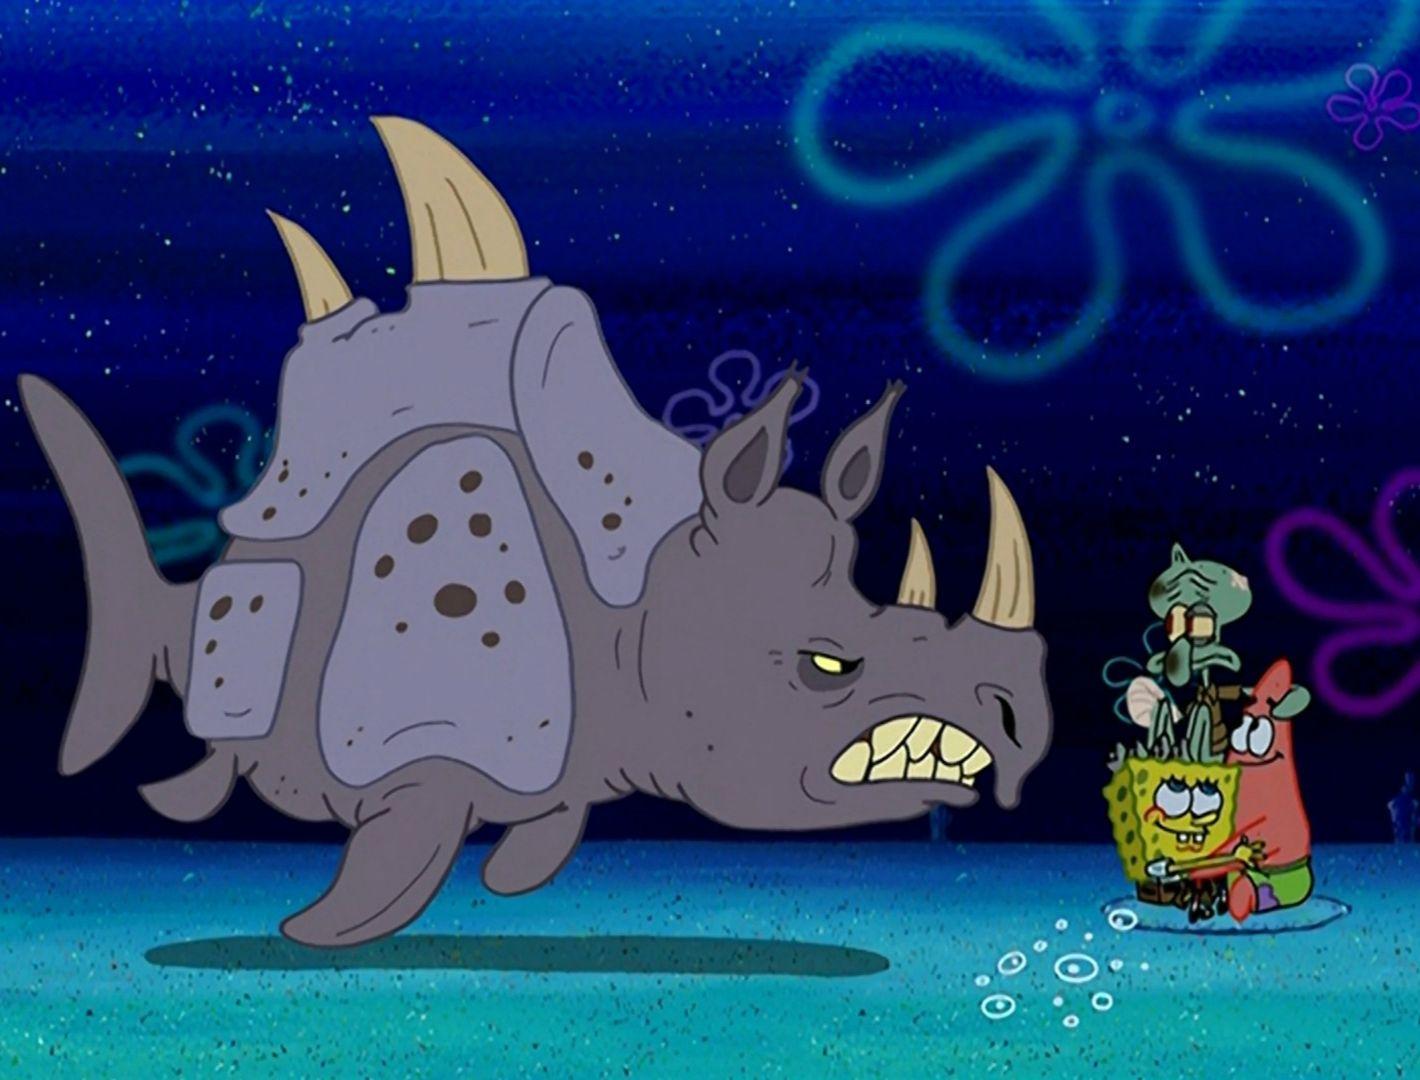 image squidward spongebob patrick u0026 1 sea rhino jpg